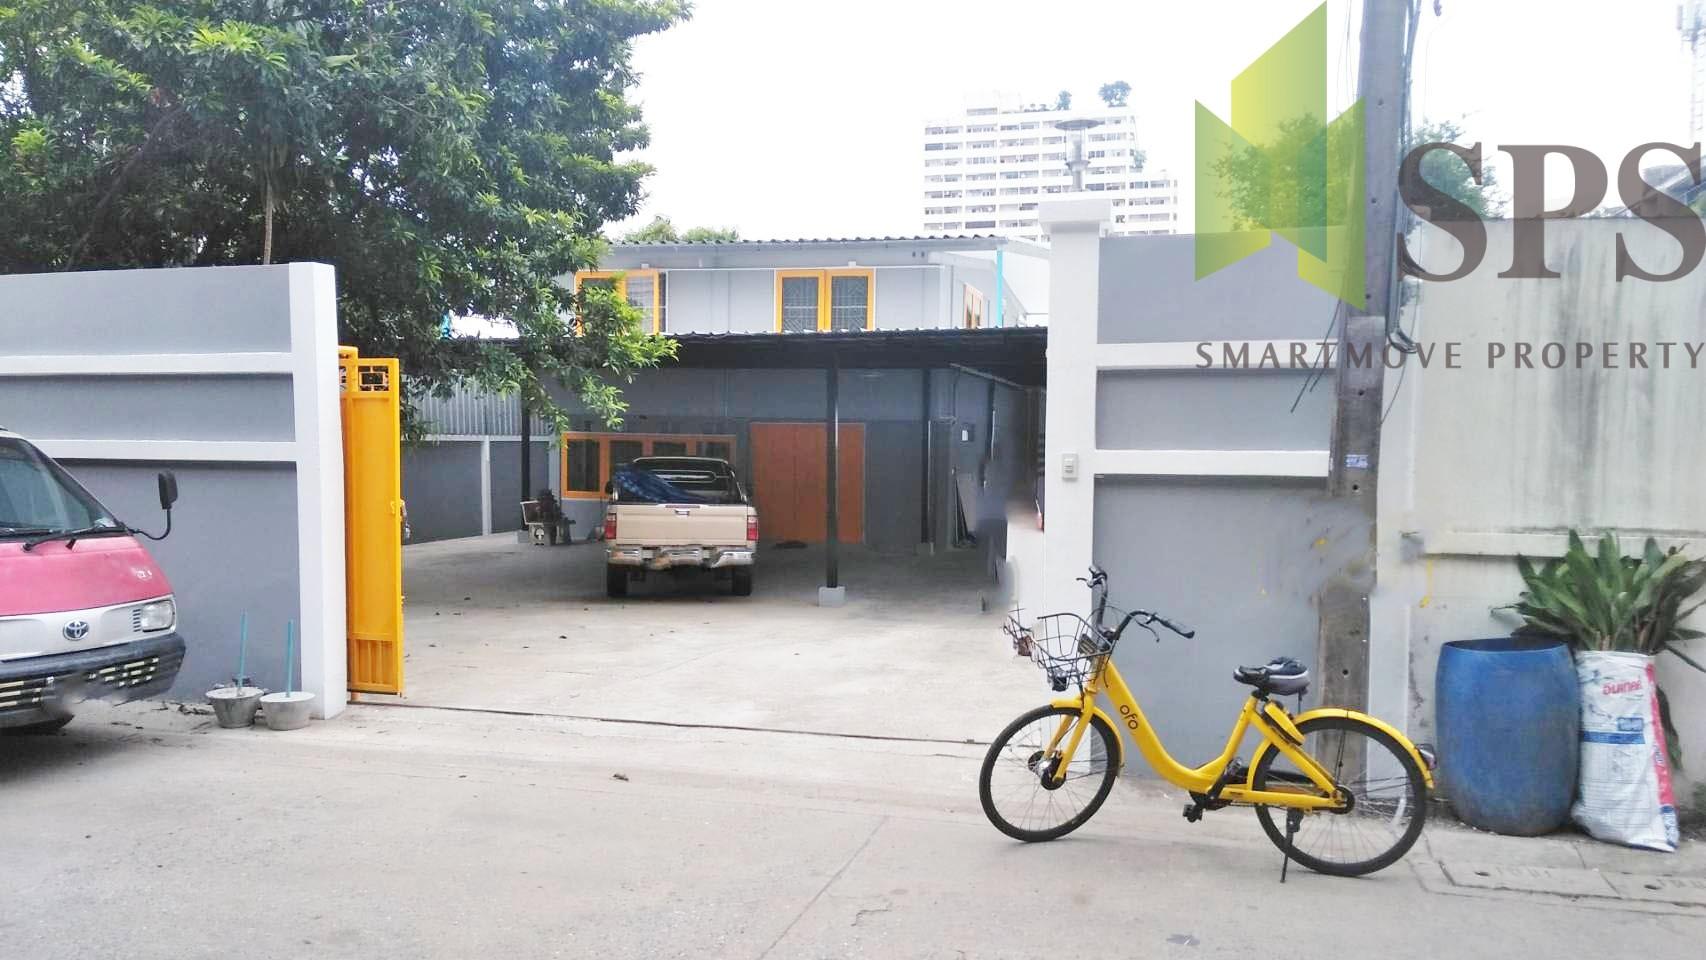 For Rent Home Office ให้เช่าโฮมออฟฟิศ หมู่บ้านมิตรภาพ ศรีนครินทร์ 38 (SPS Ann299)